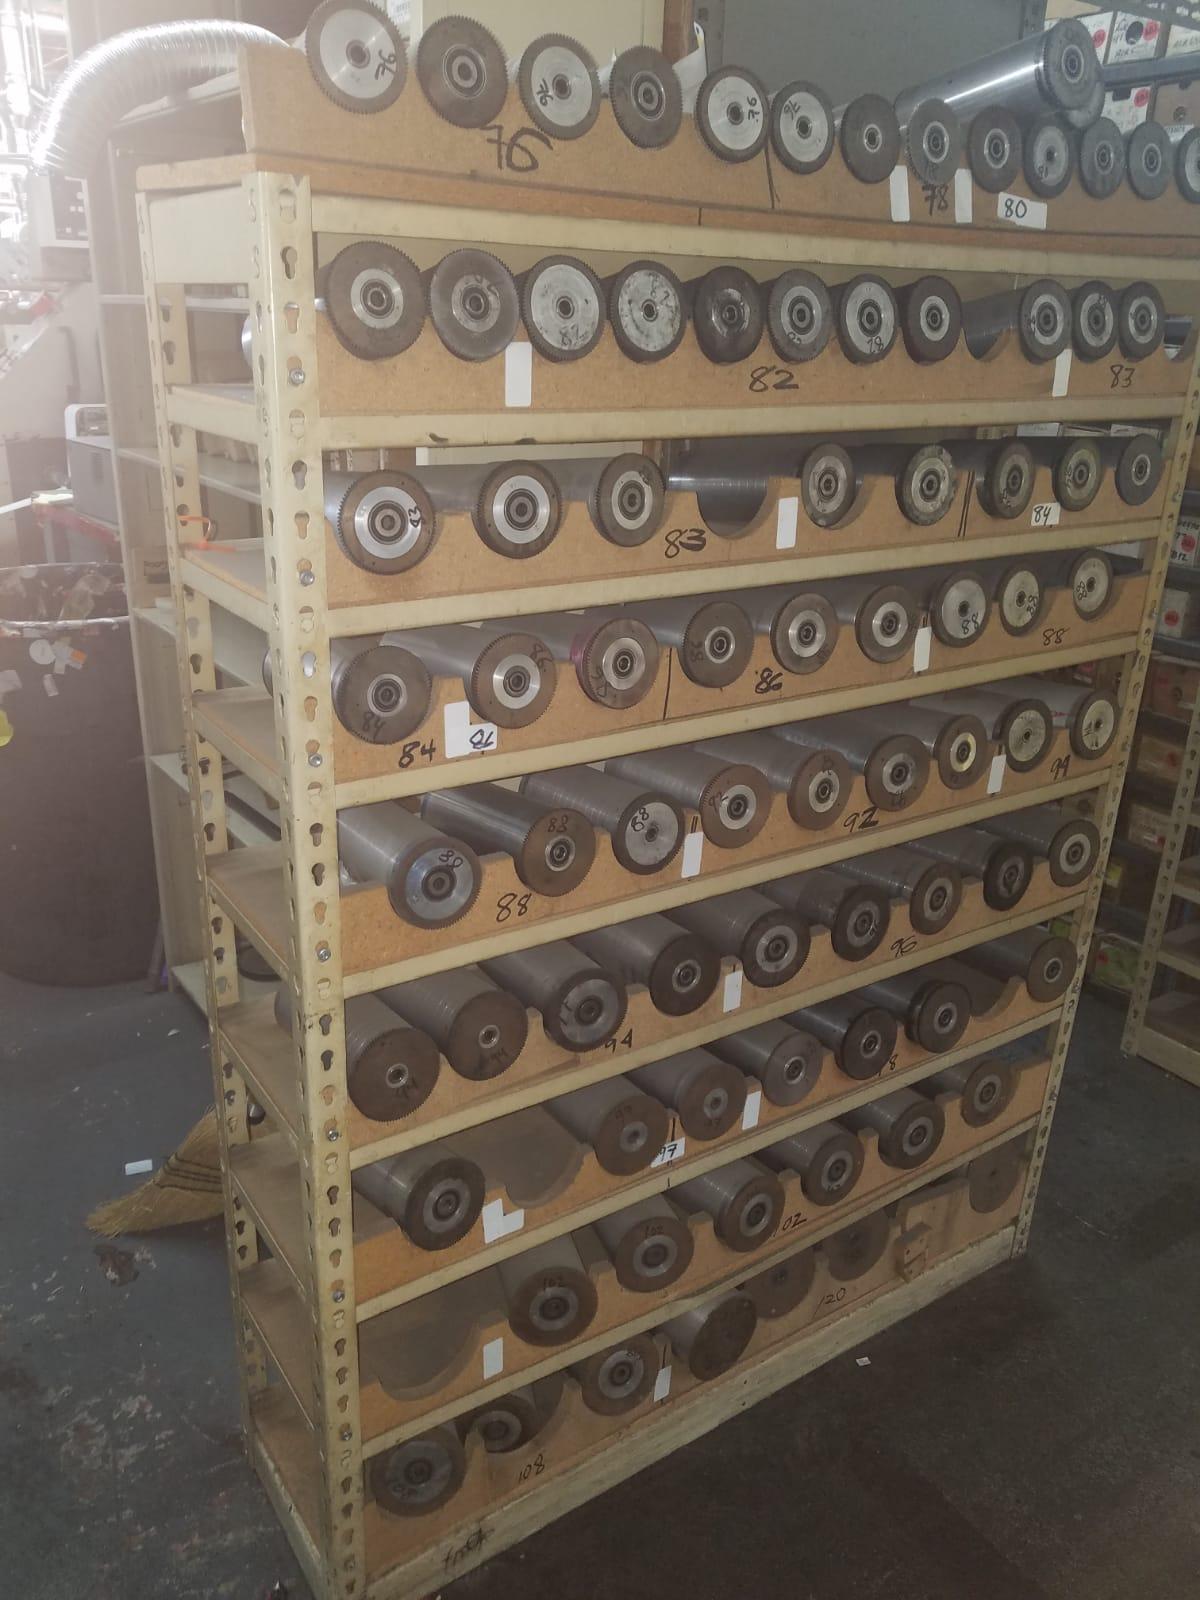 Webtron 750 HQV - Used Flexo Printing Presses and Used Flexographic Equipment-15